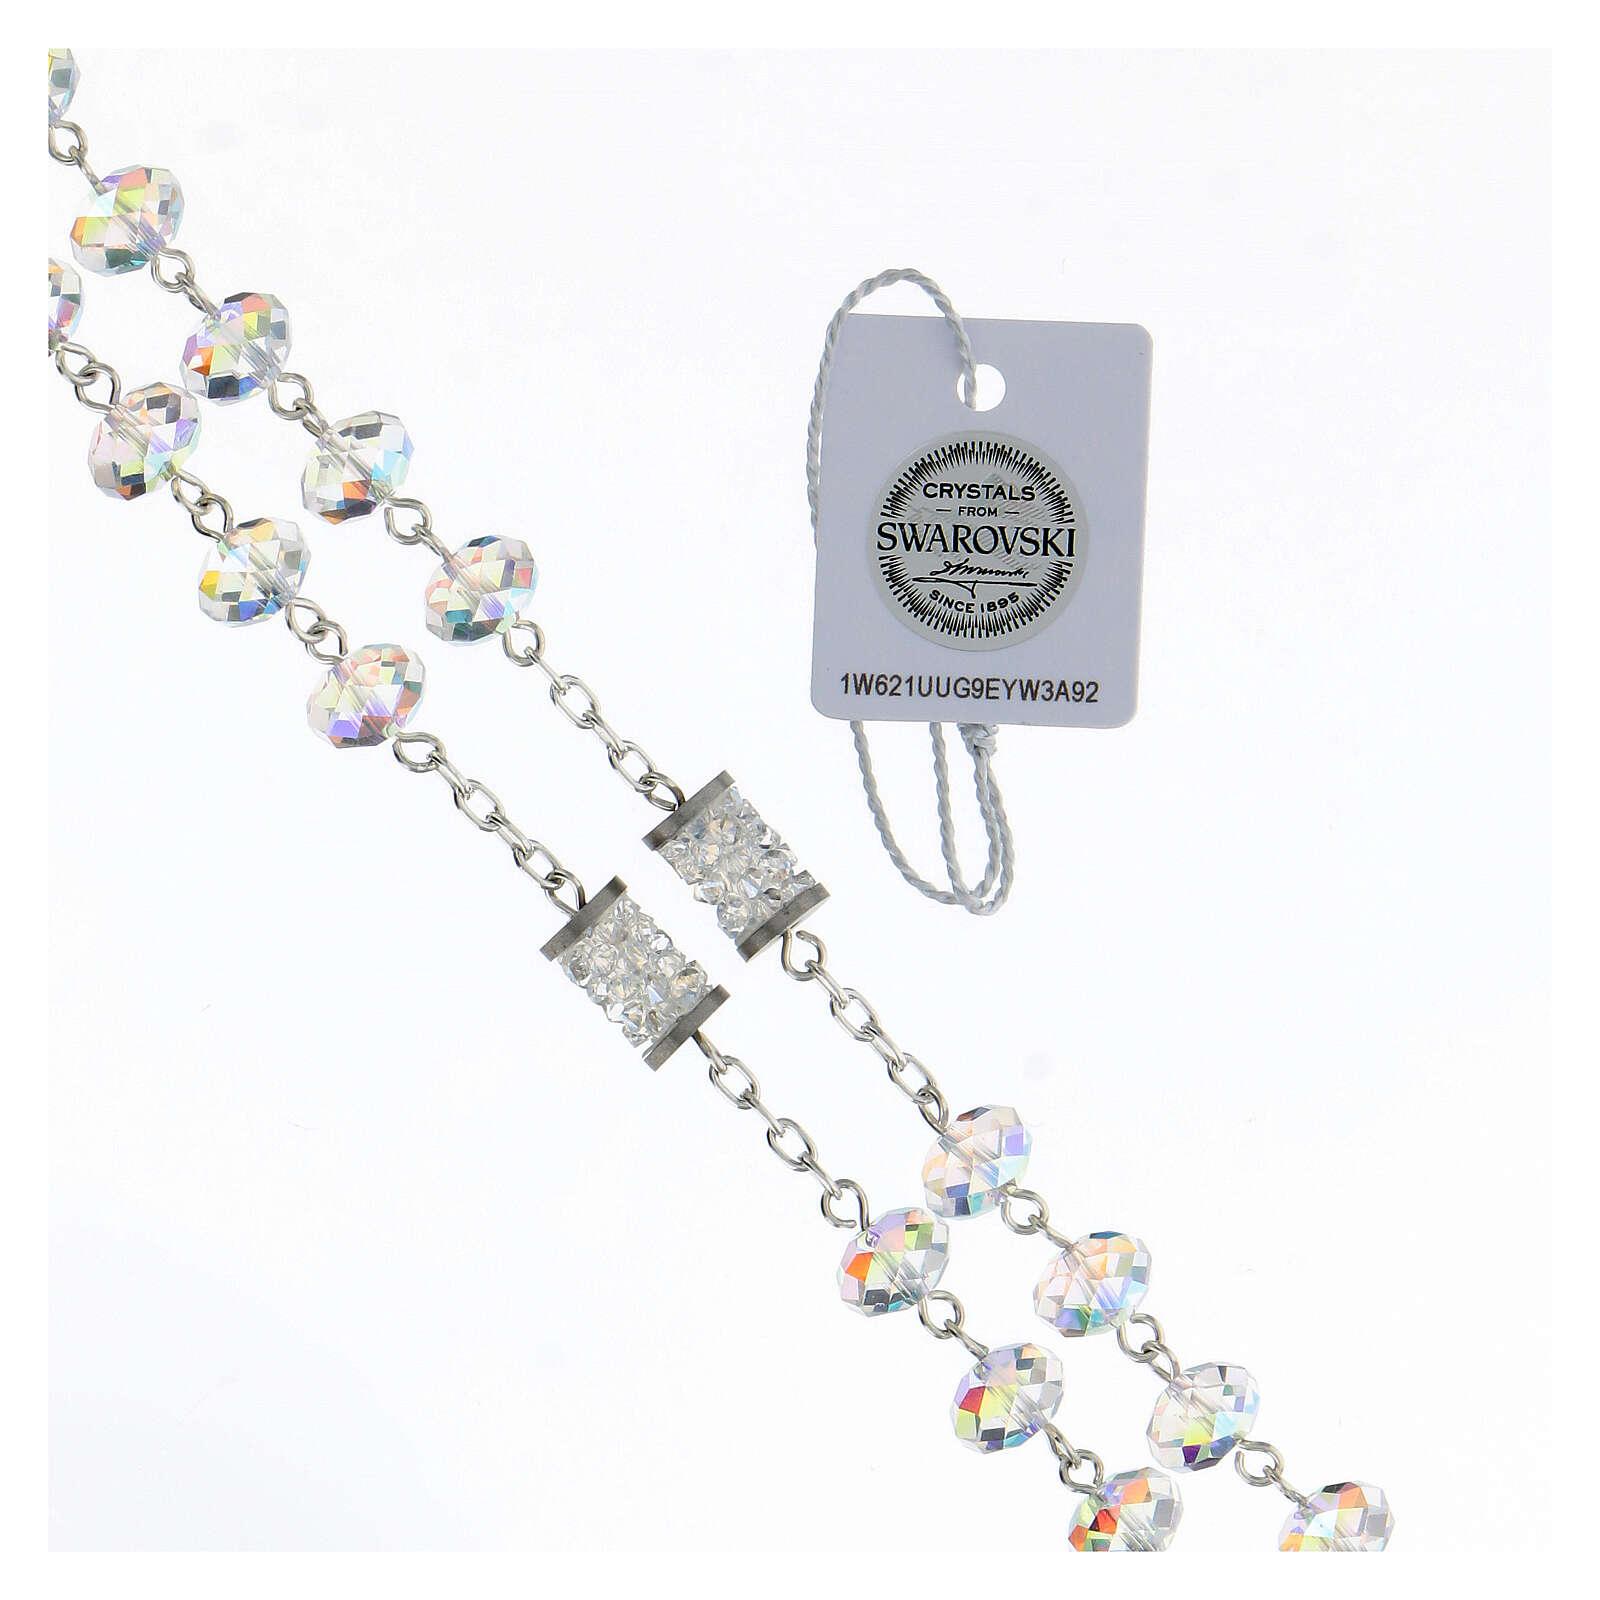 Rosario Swarovski grani 8 mm briolé pater bussolotto argento 925 4